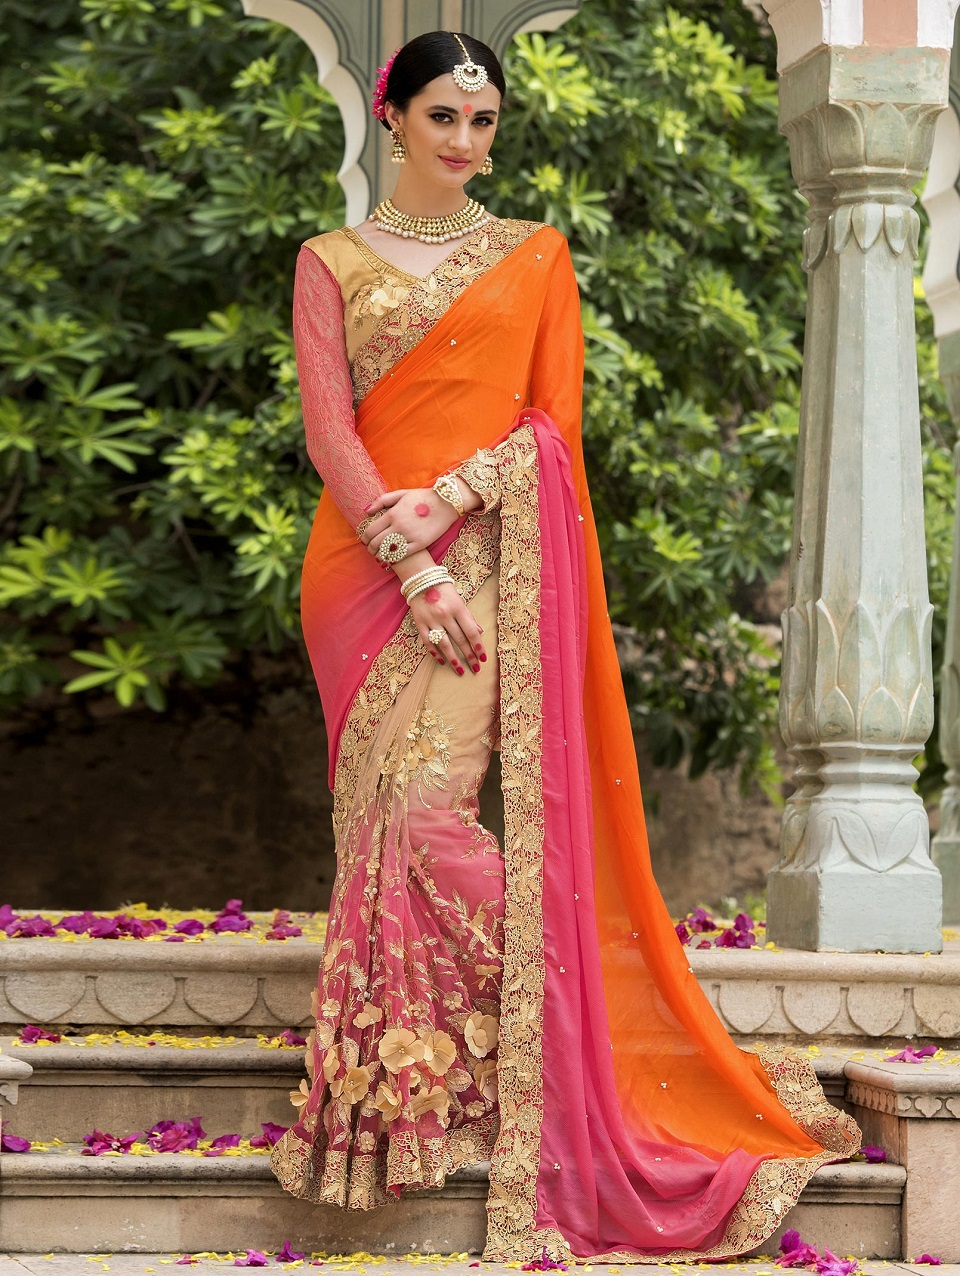 indian wedding saree latest designs trends 2017 2018